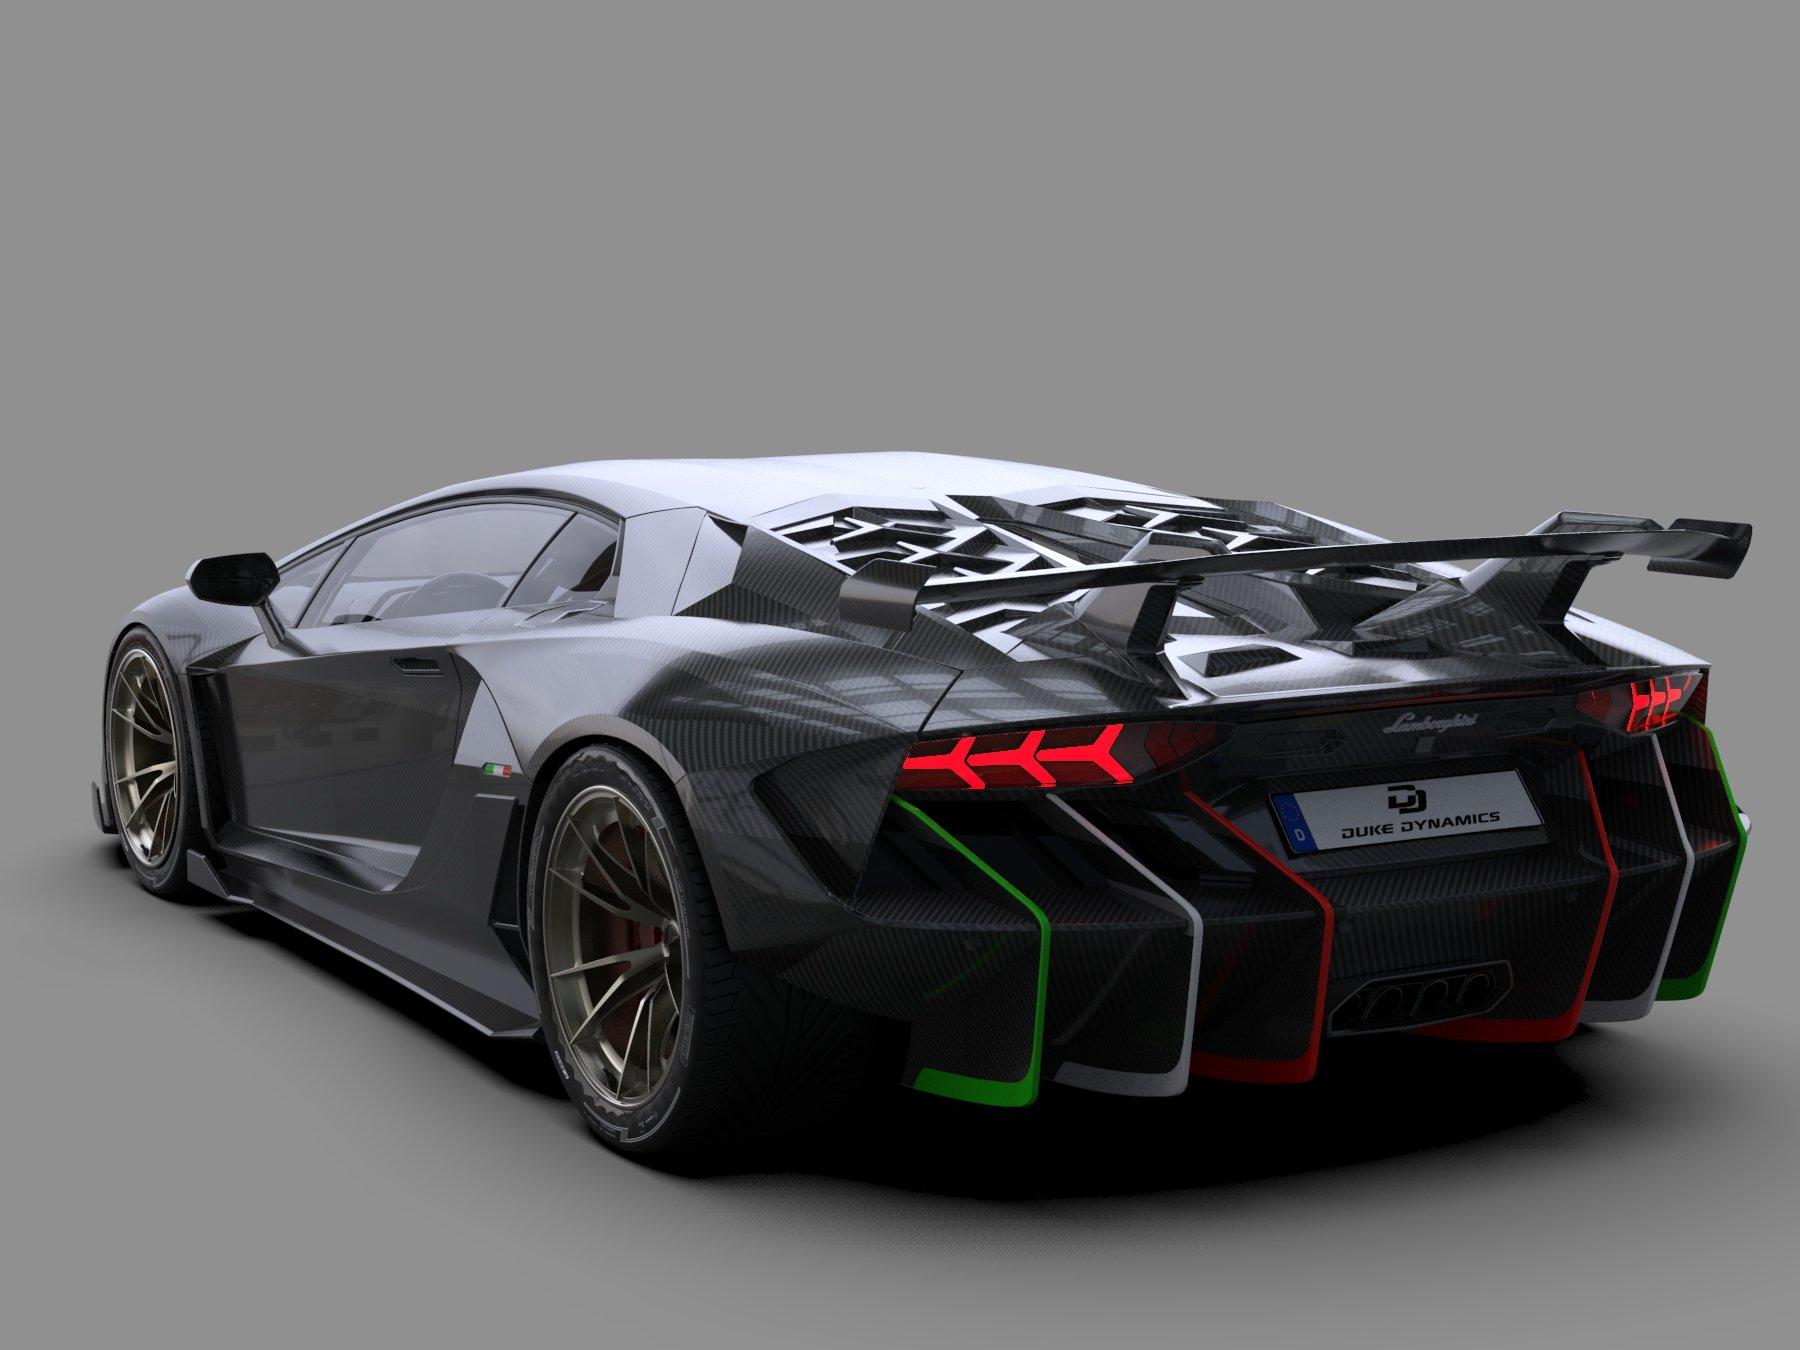 Lamborghini_Aventador_by_Duke_Dynamics_0007